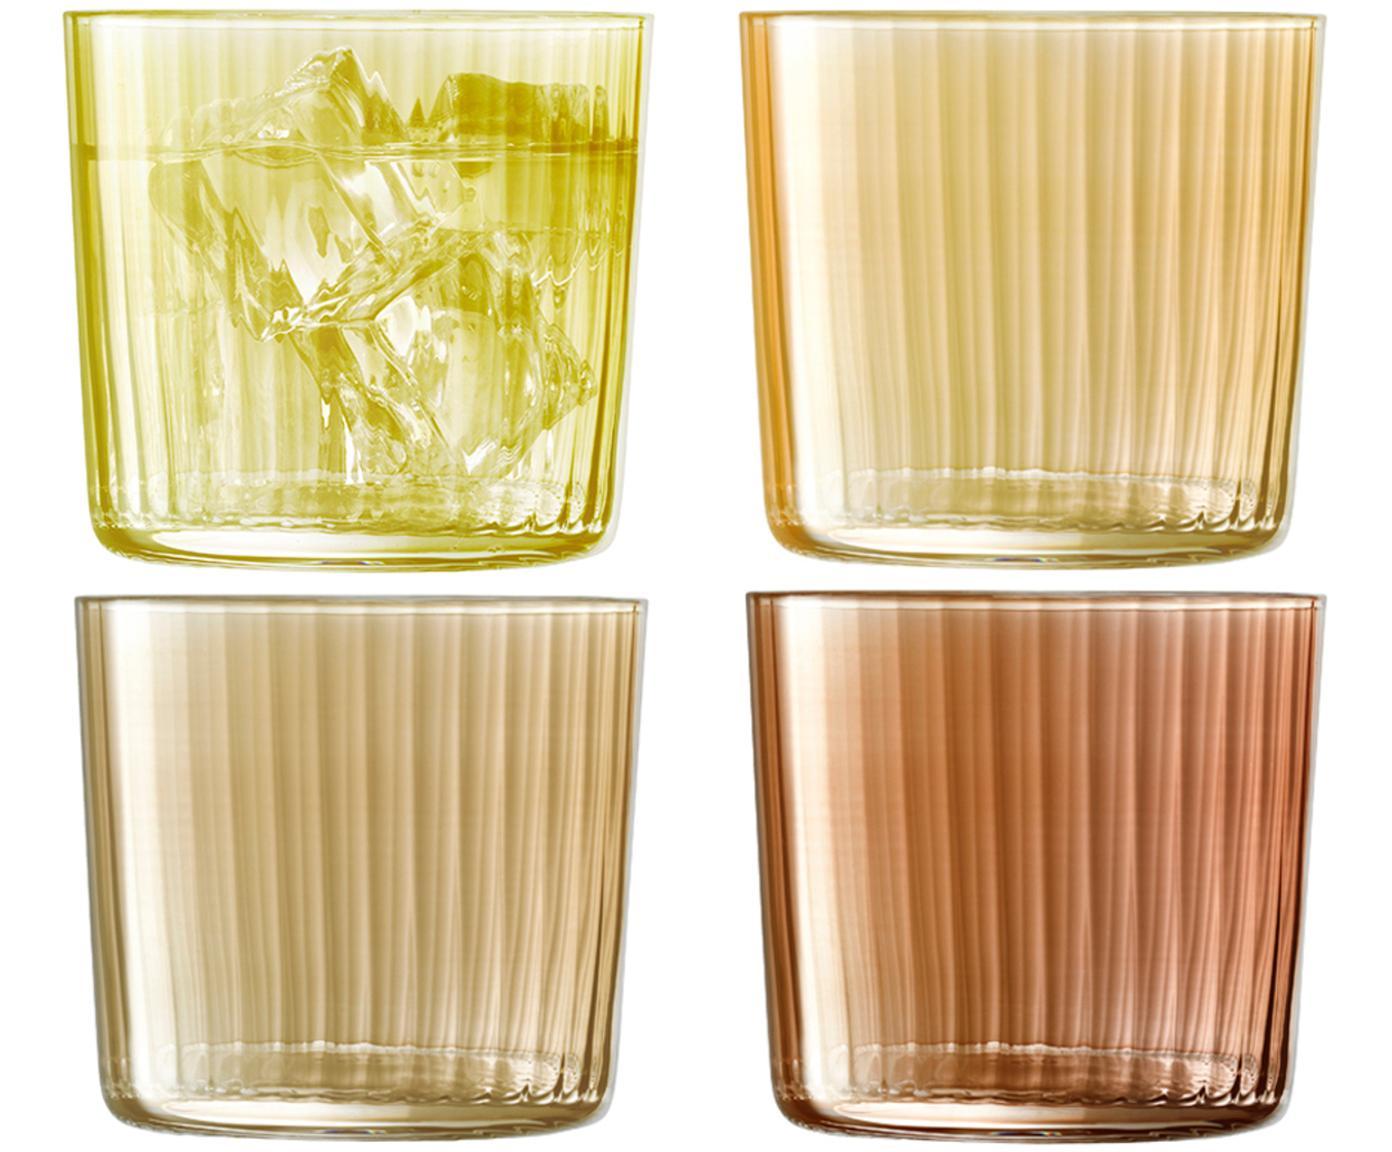 Set 4 bicchieri acqua in vetro soffiato Gemme, Vetro, gonfiabile, Tonalità marrone, Ø 8 x Alt. 7 cm